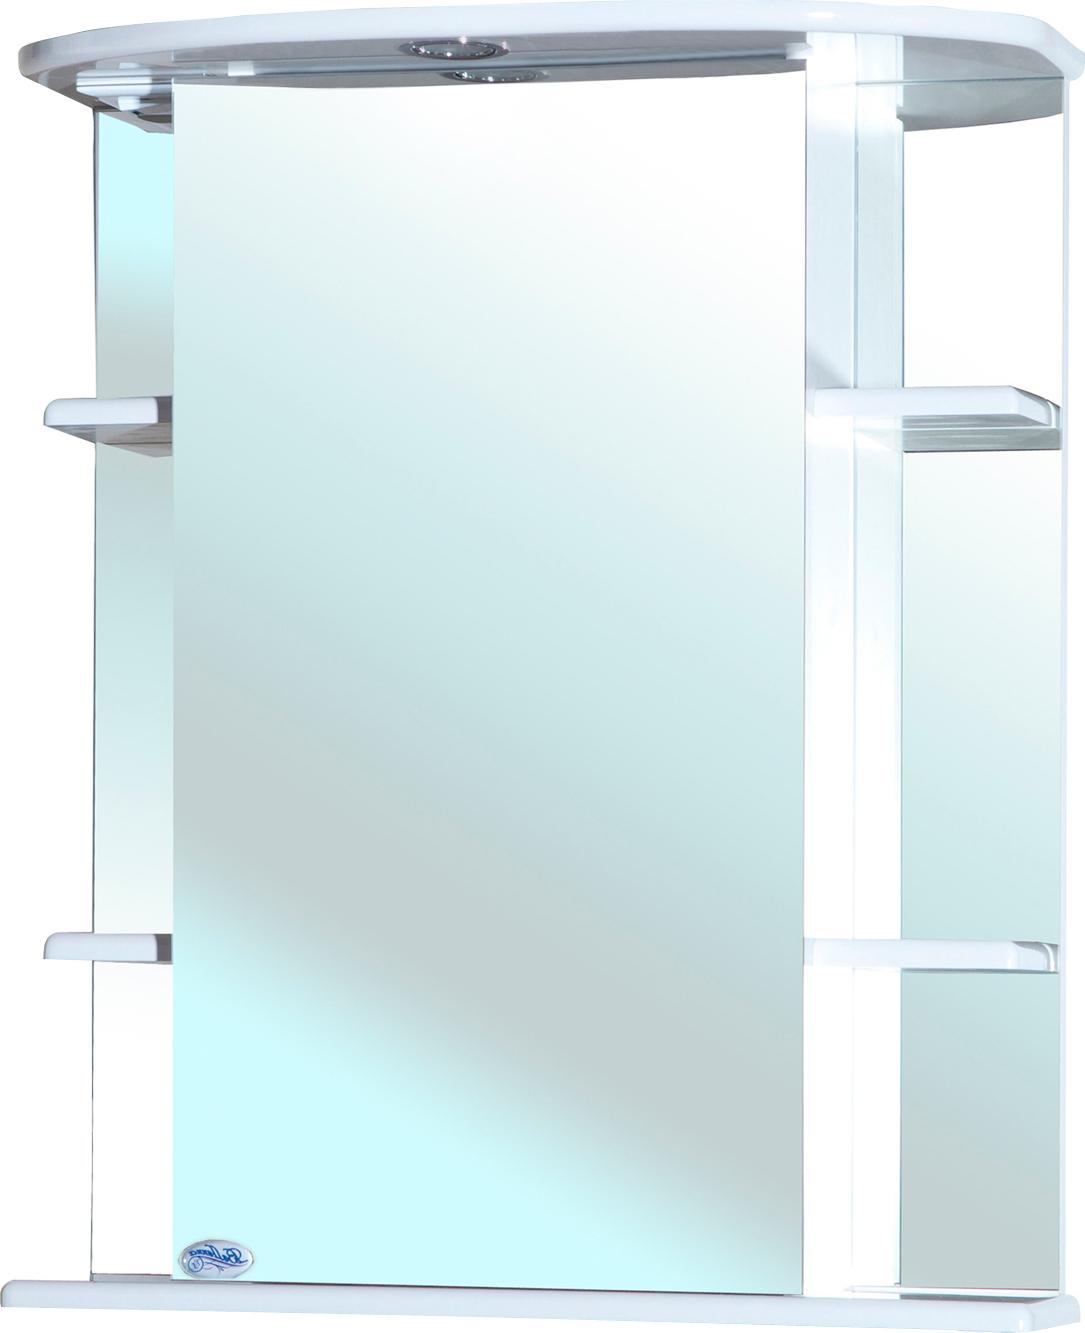 Зеркало-шкаф Bellezza Магнолия 55 R